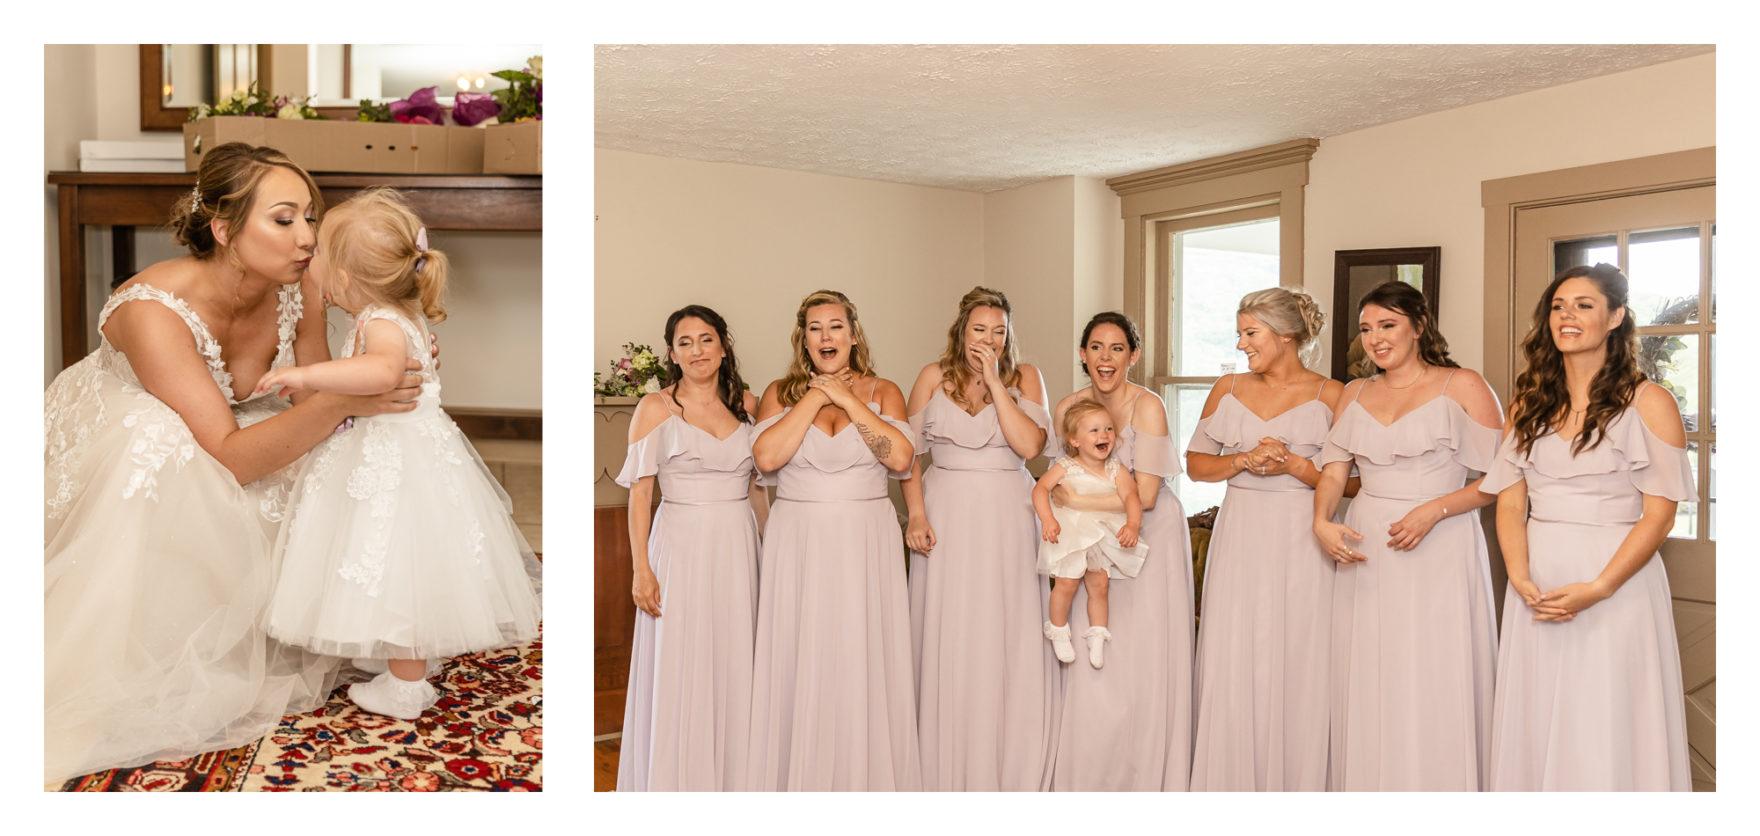 Summer Wedding Stone Ridge Hollow June Wedding Lavender dresses bridesmaids